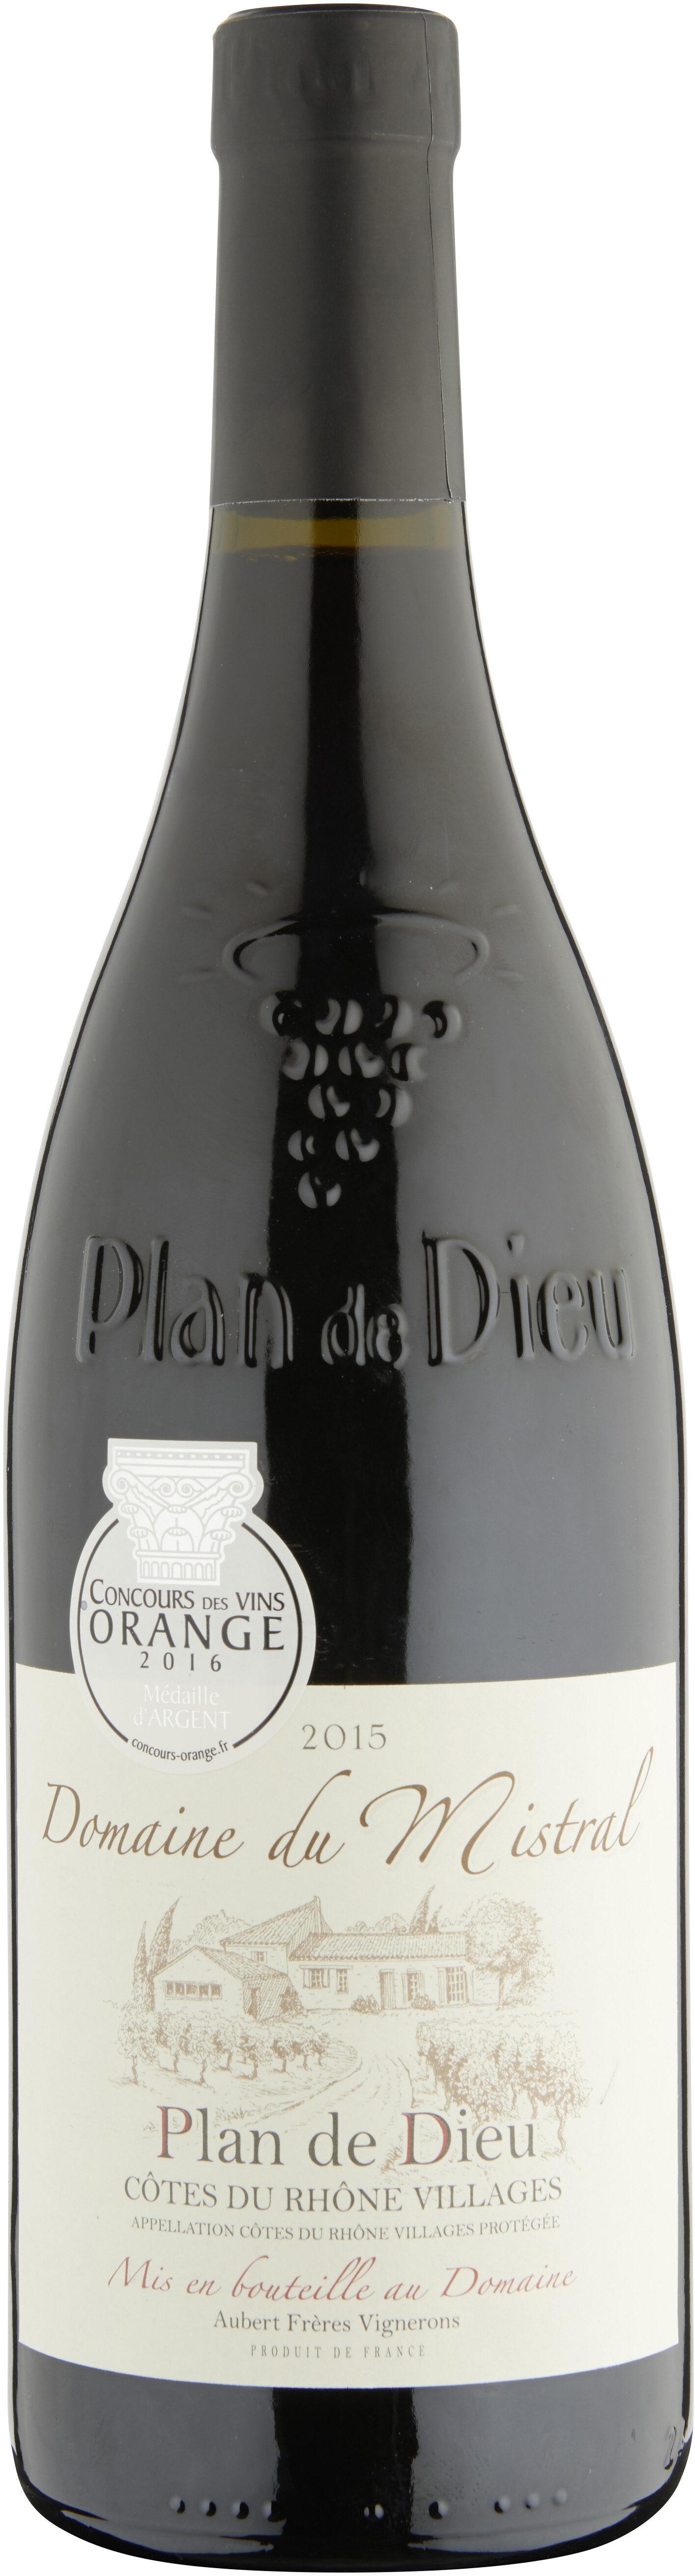 Plan de Dieu 2011 - Prodotto - fr